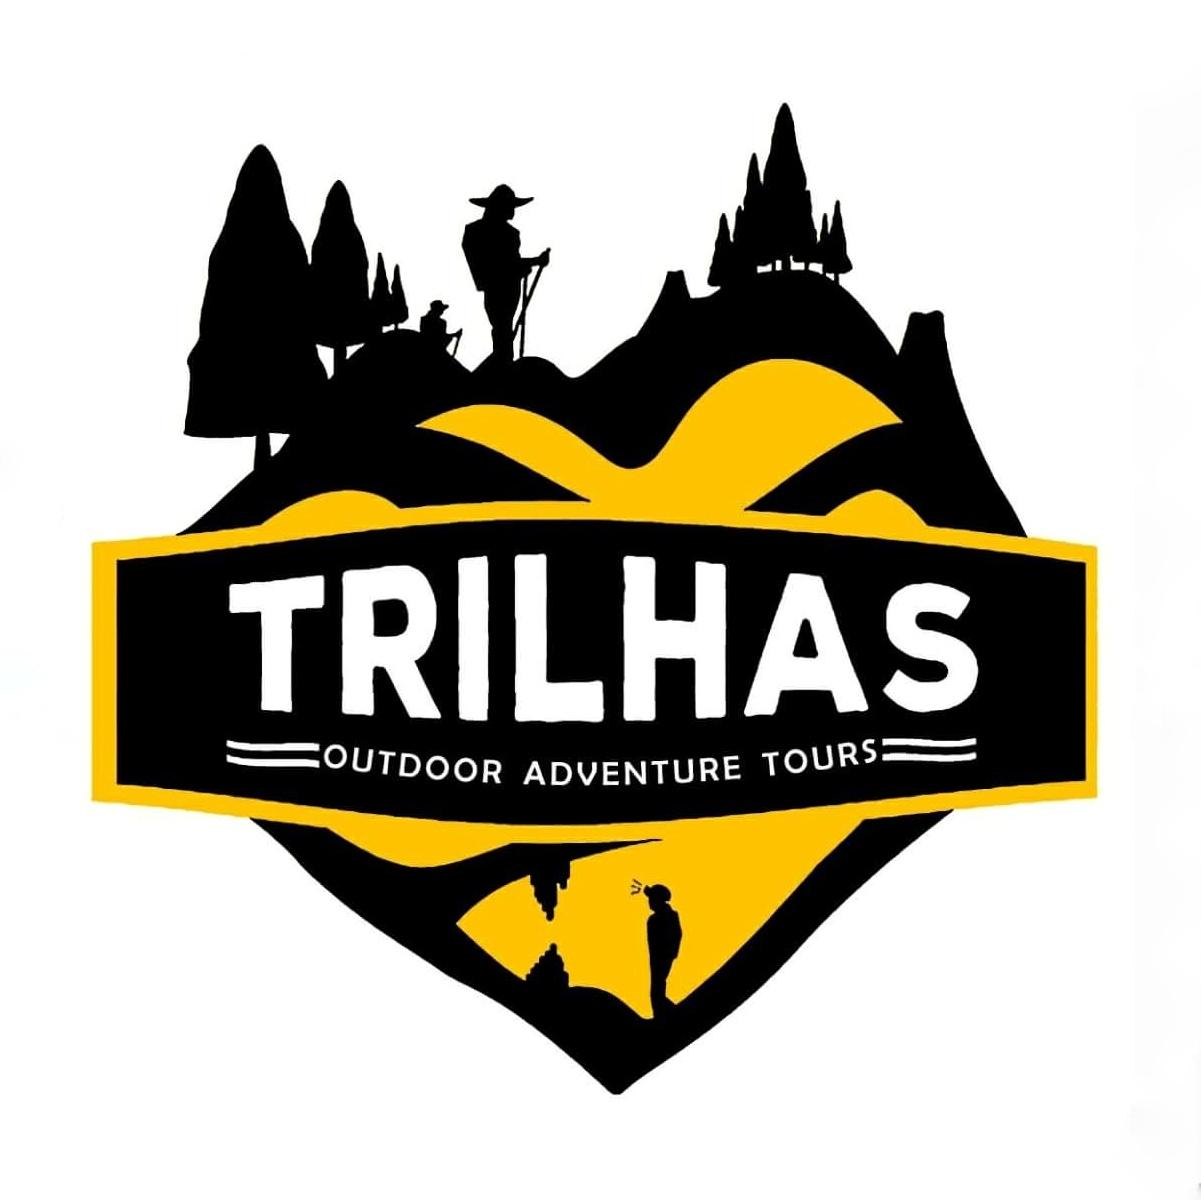 TRILHAS Outdoor Adventure Tours